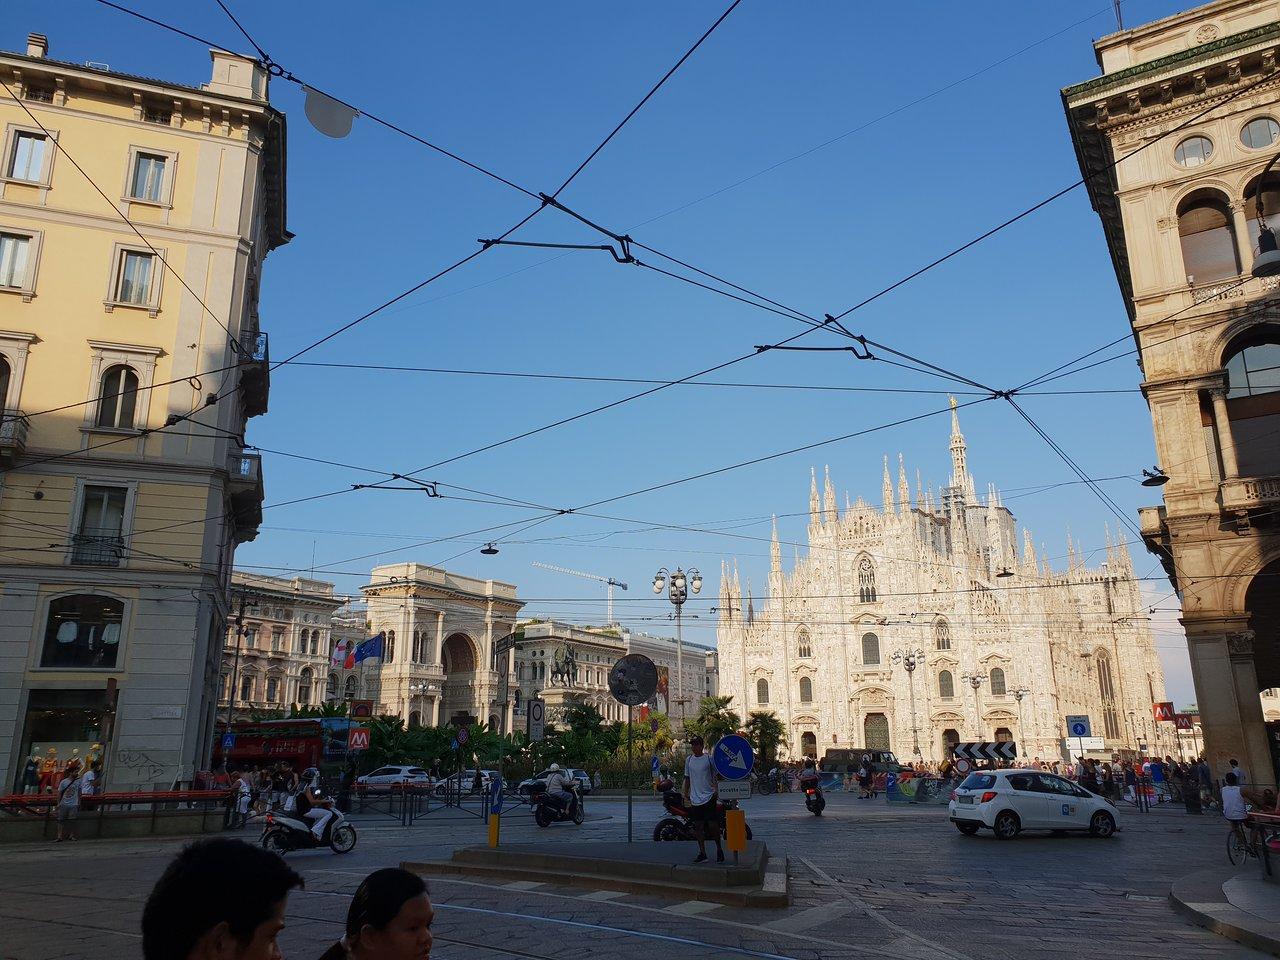 Via San Maurilio Milano le texture milano - prices & lodging reviews (milan, italy